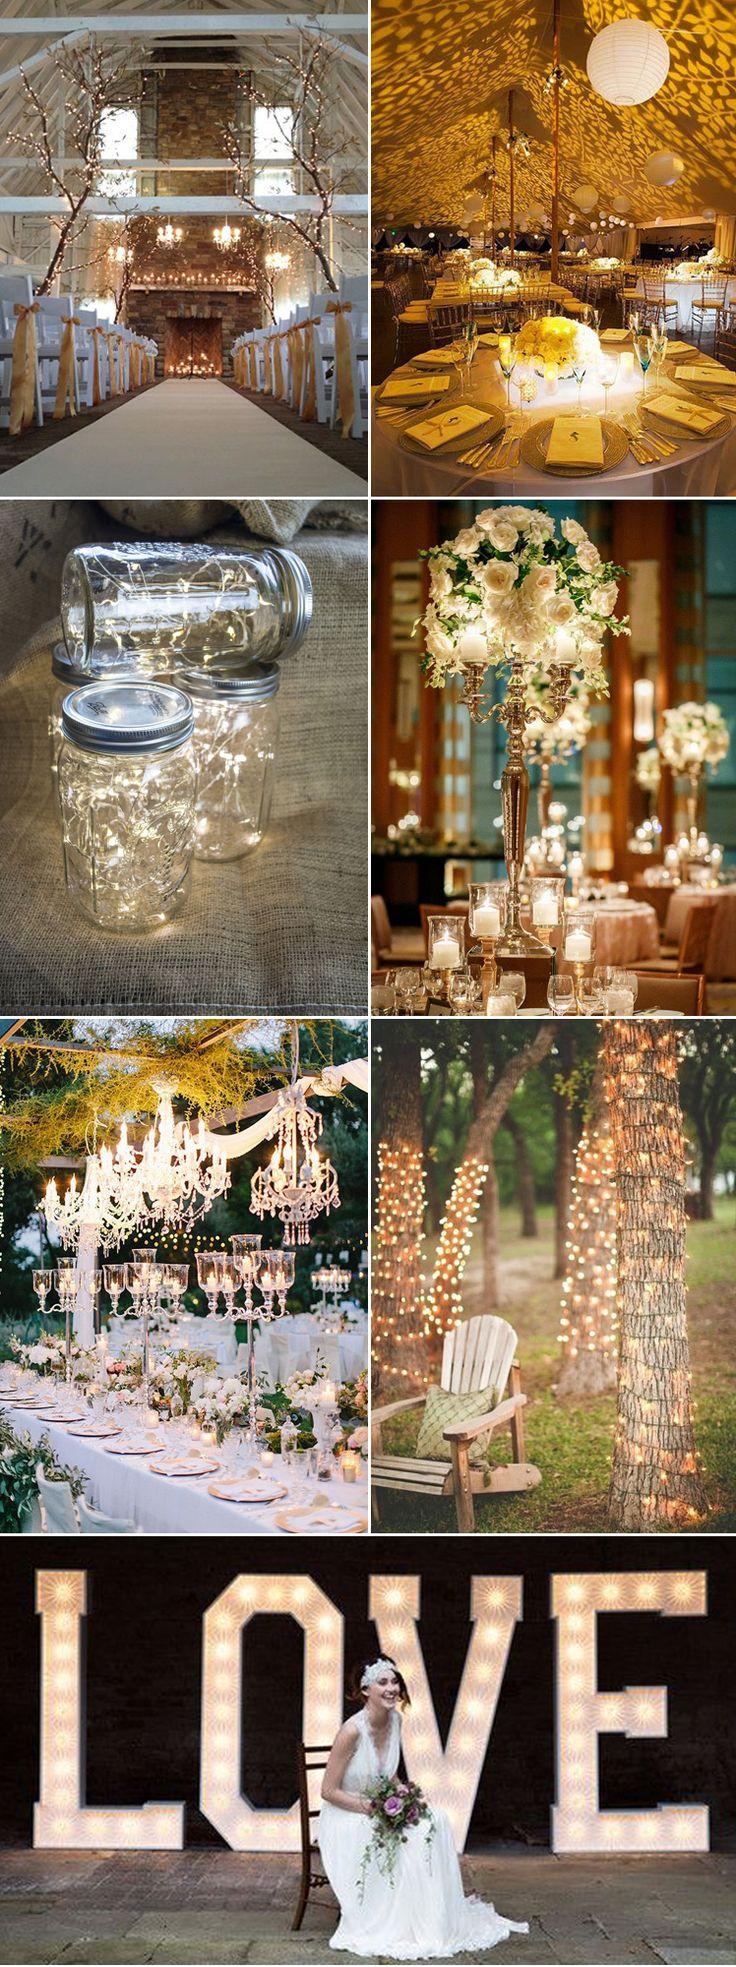 Glittering ideas to light up your wedding on GS Inspiration | Glitzy Secrets